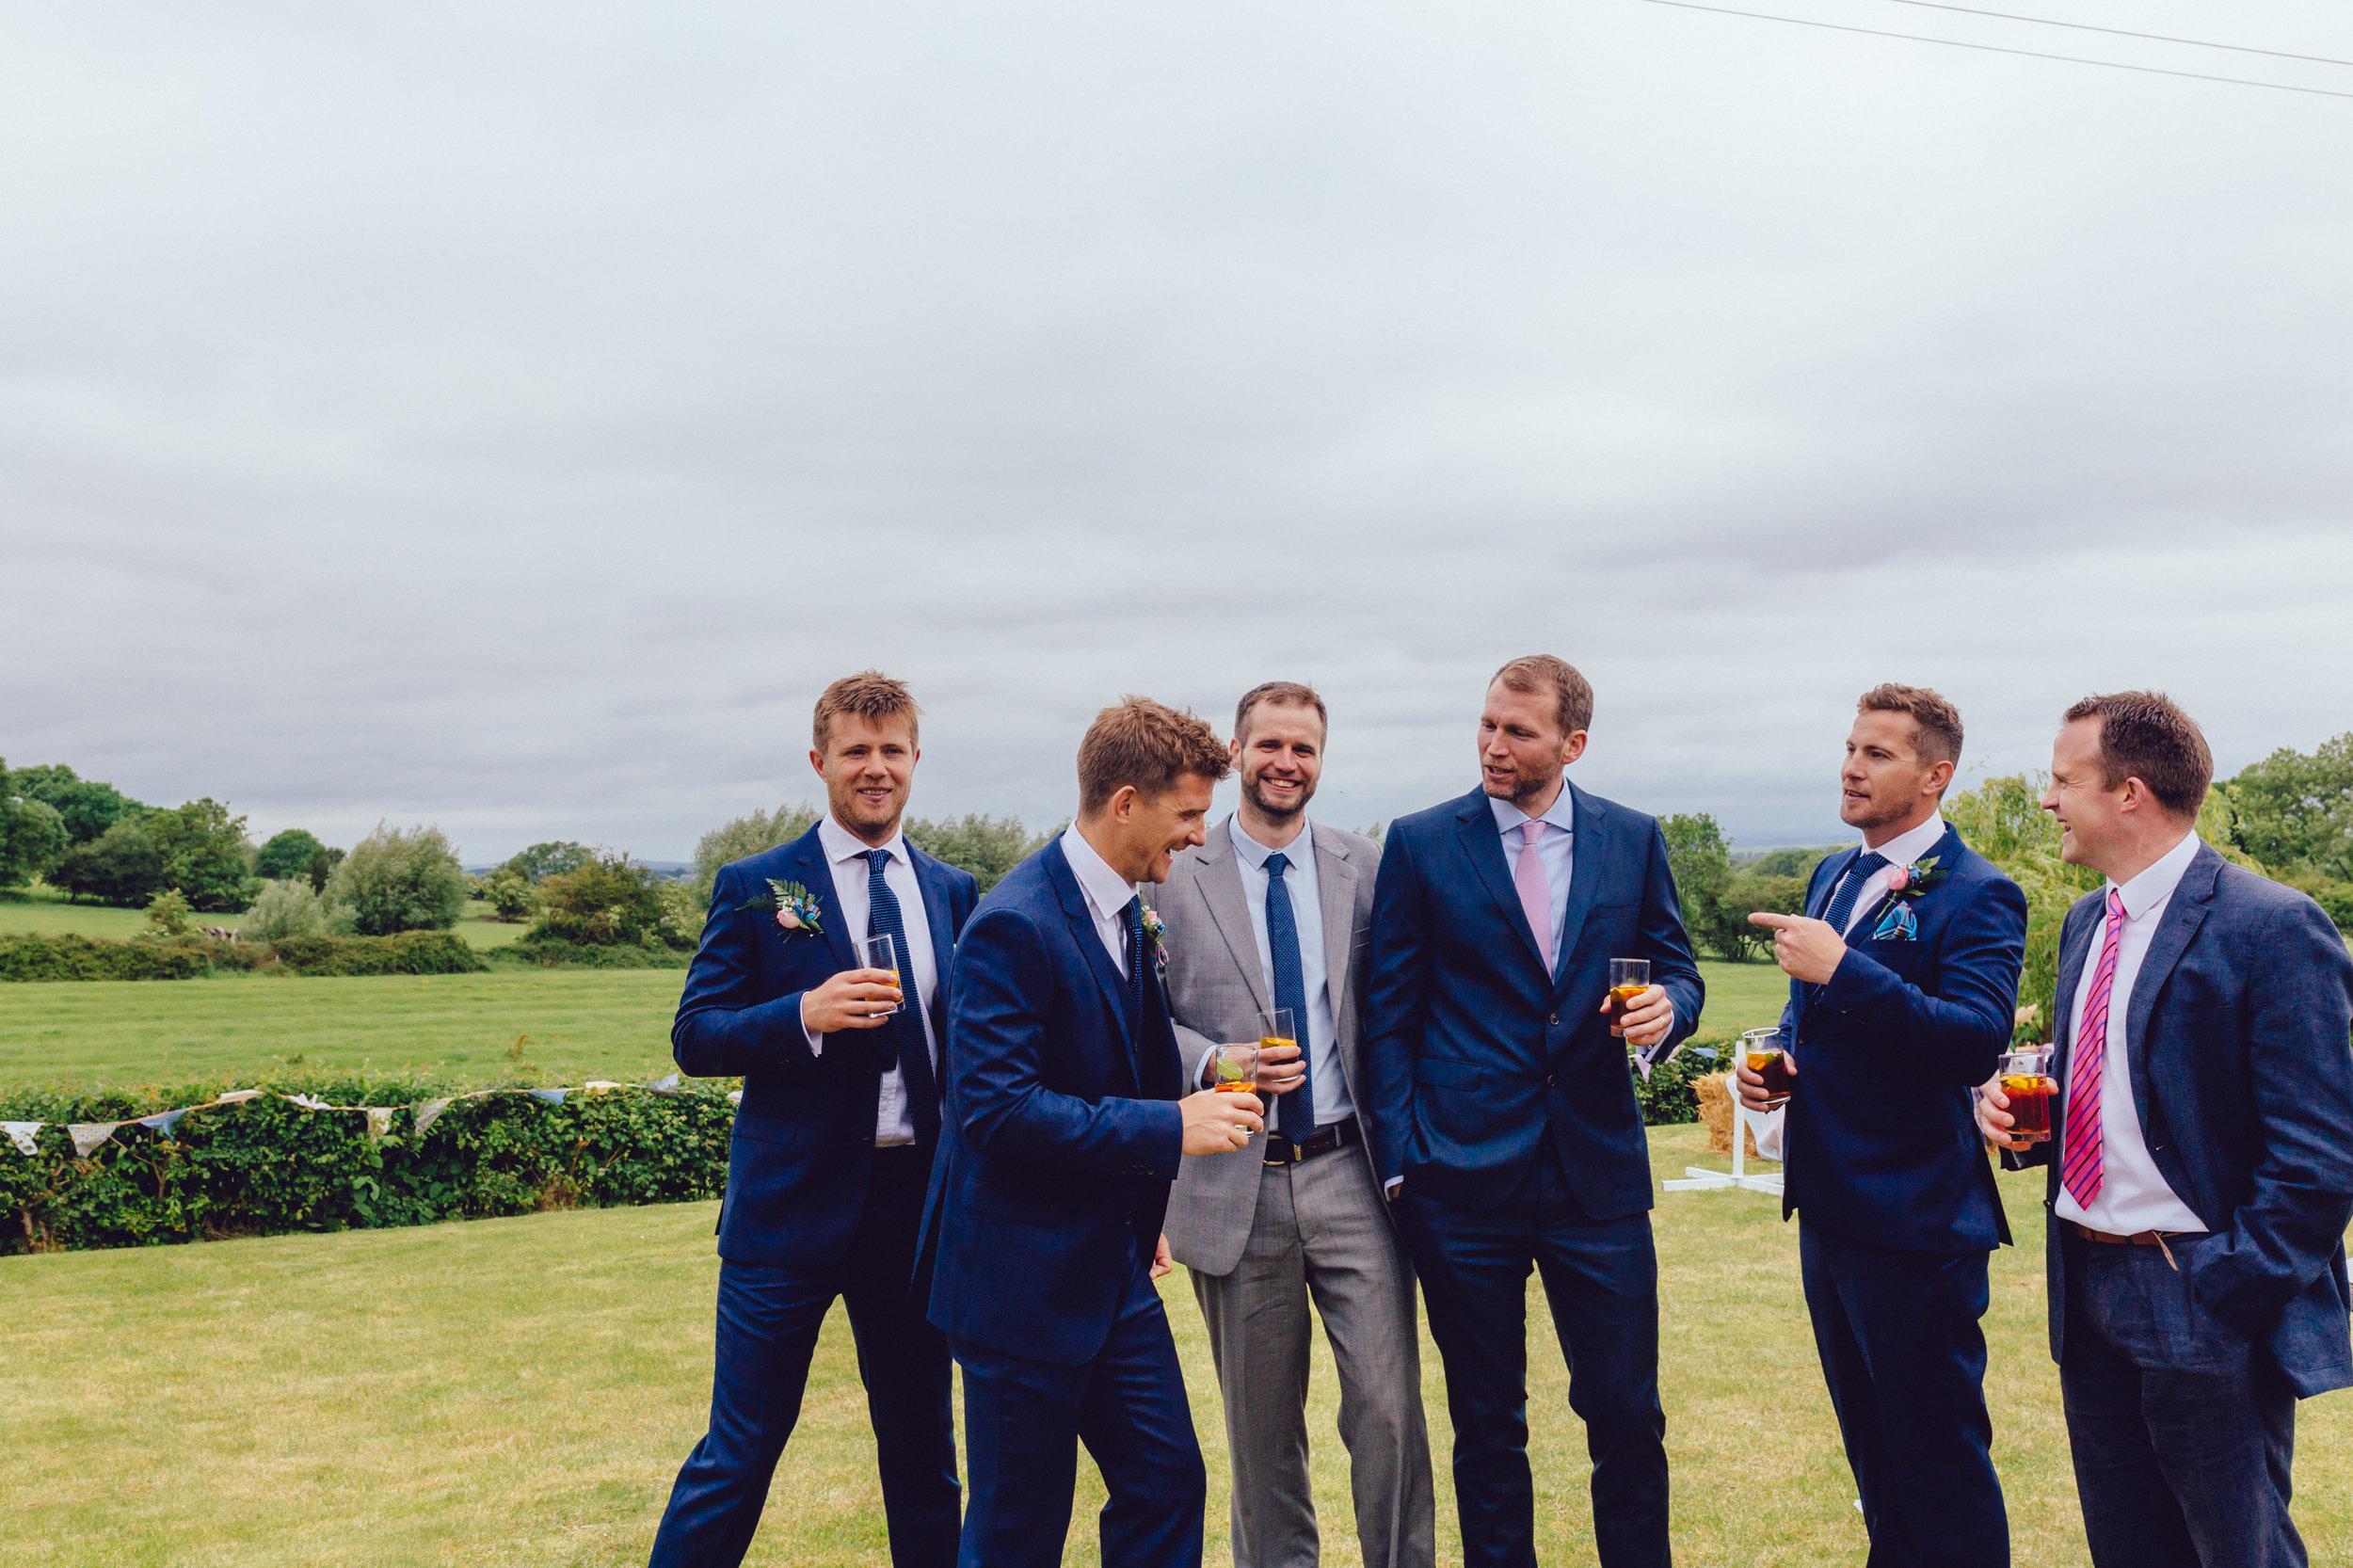 Birmingham photographer wedding country artistic wedding photography24.jpg